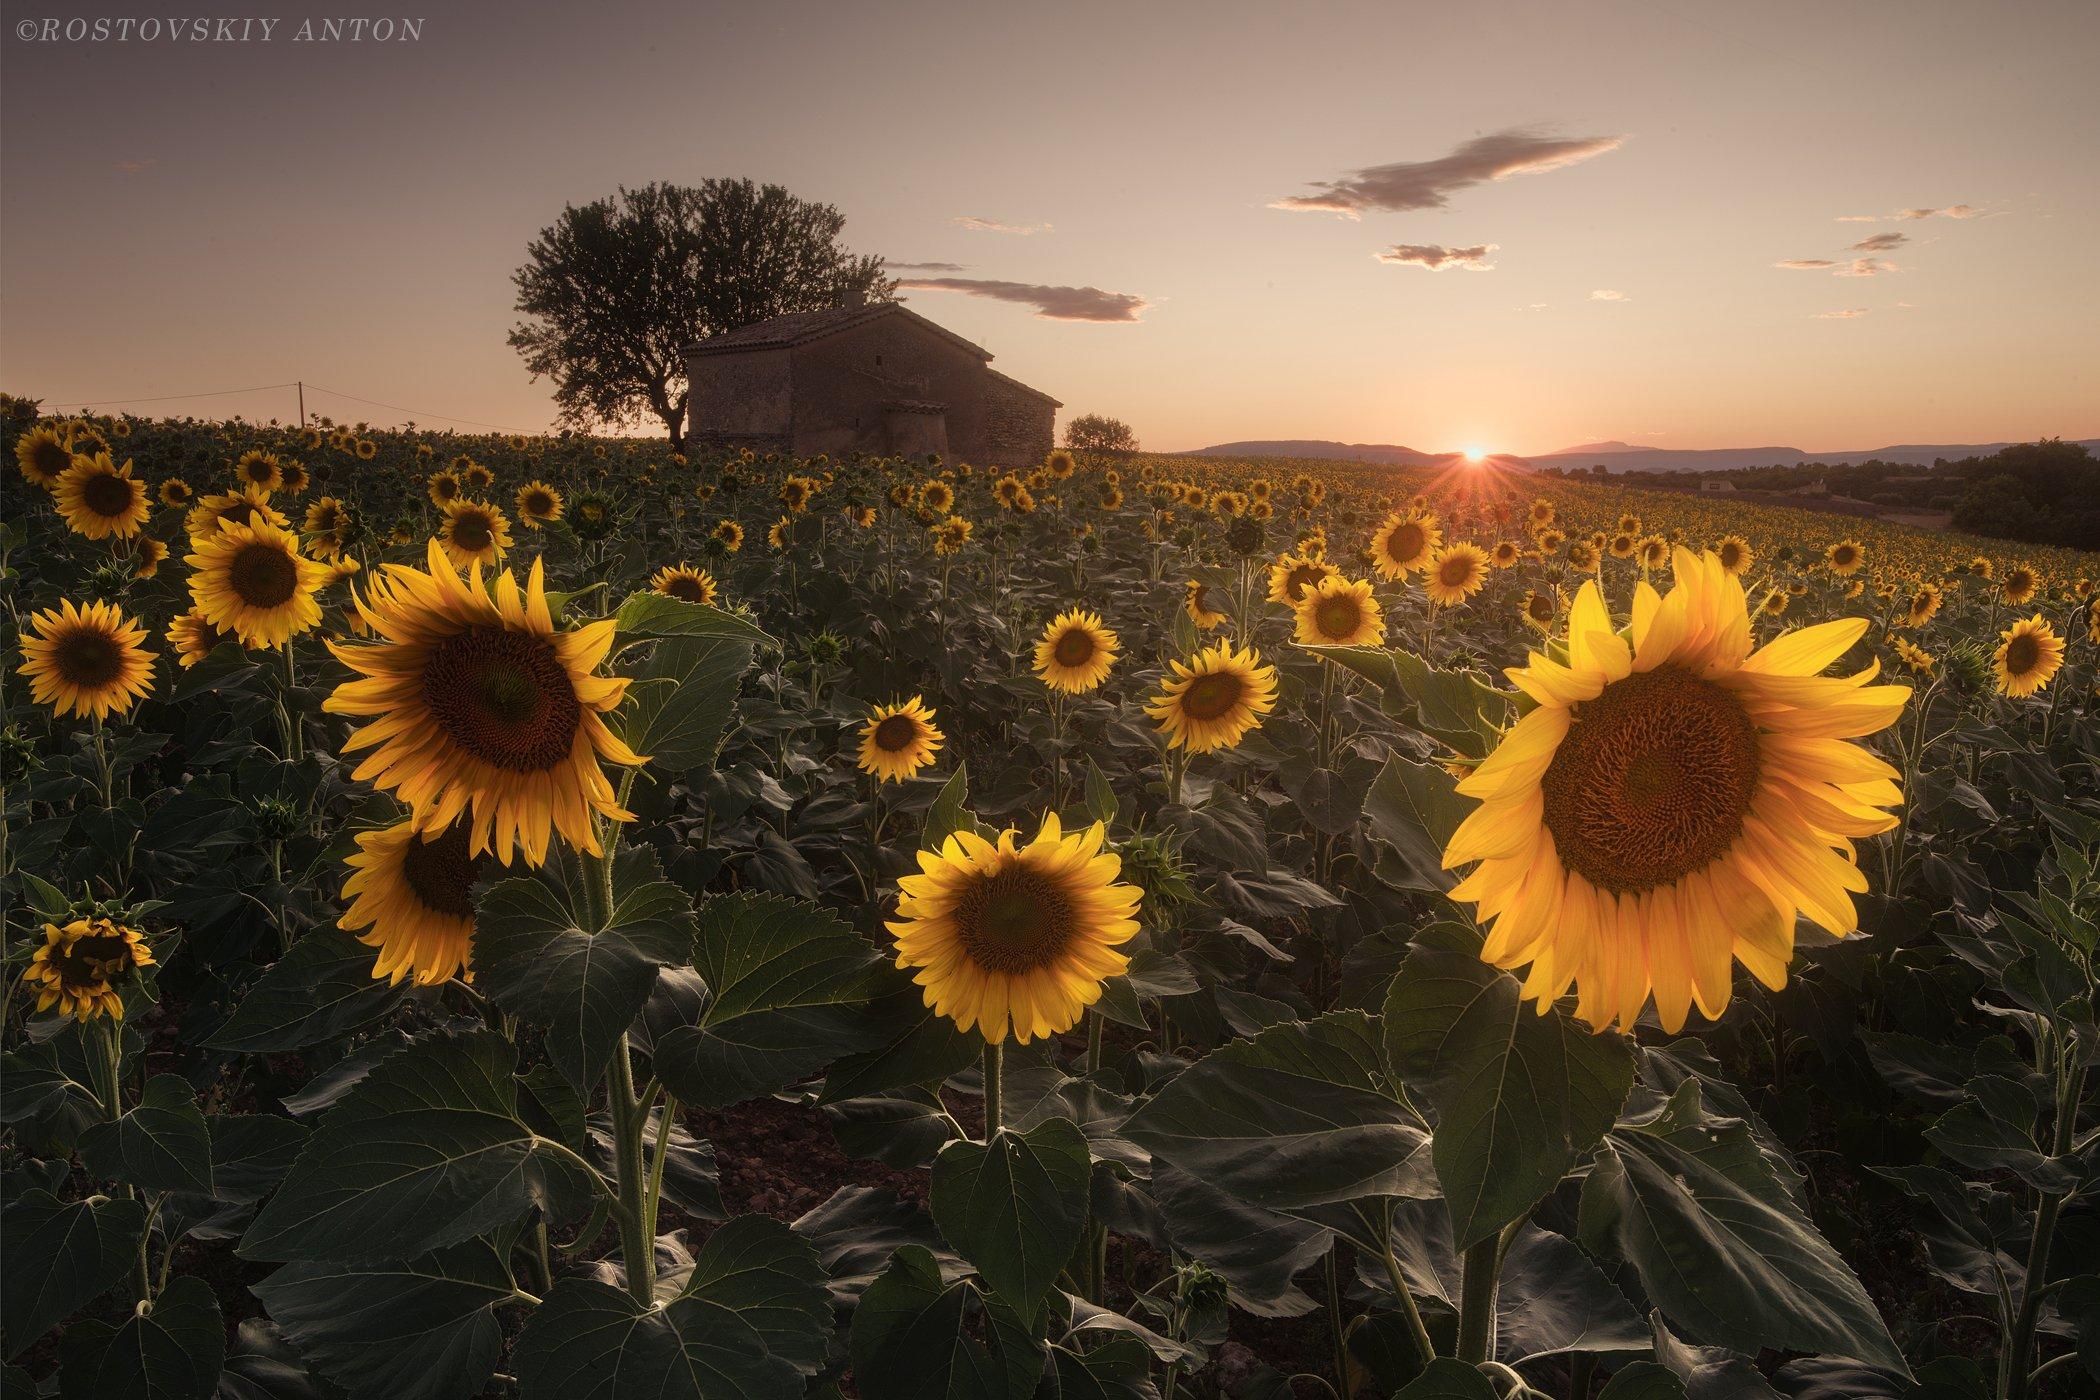 sunset, provence, france, фототур,, Ростовский Антон